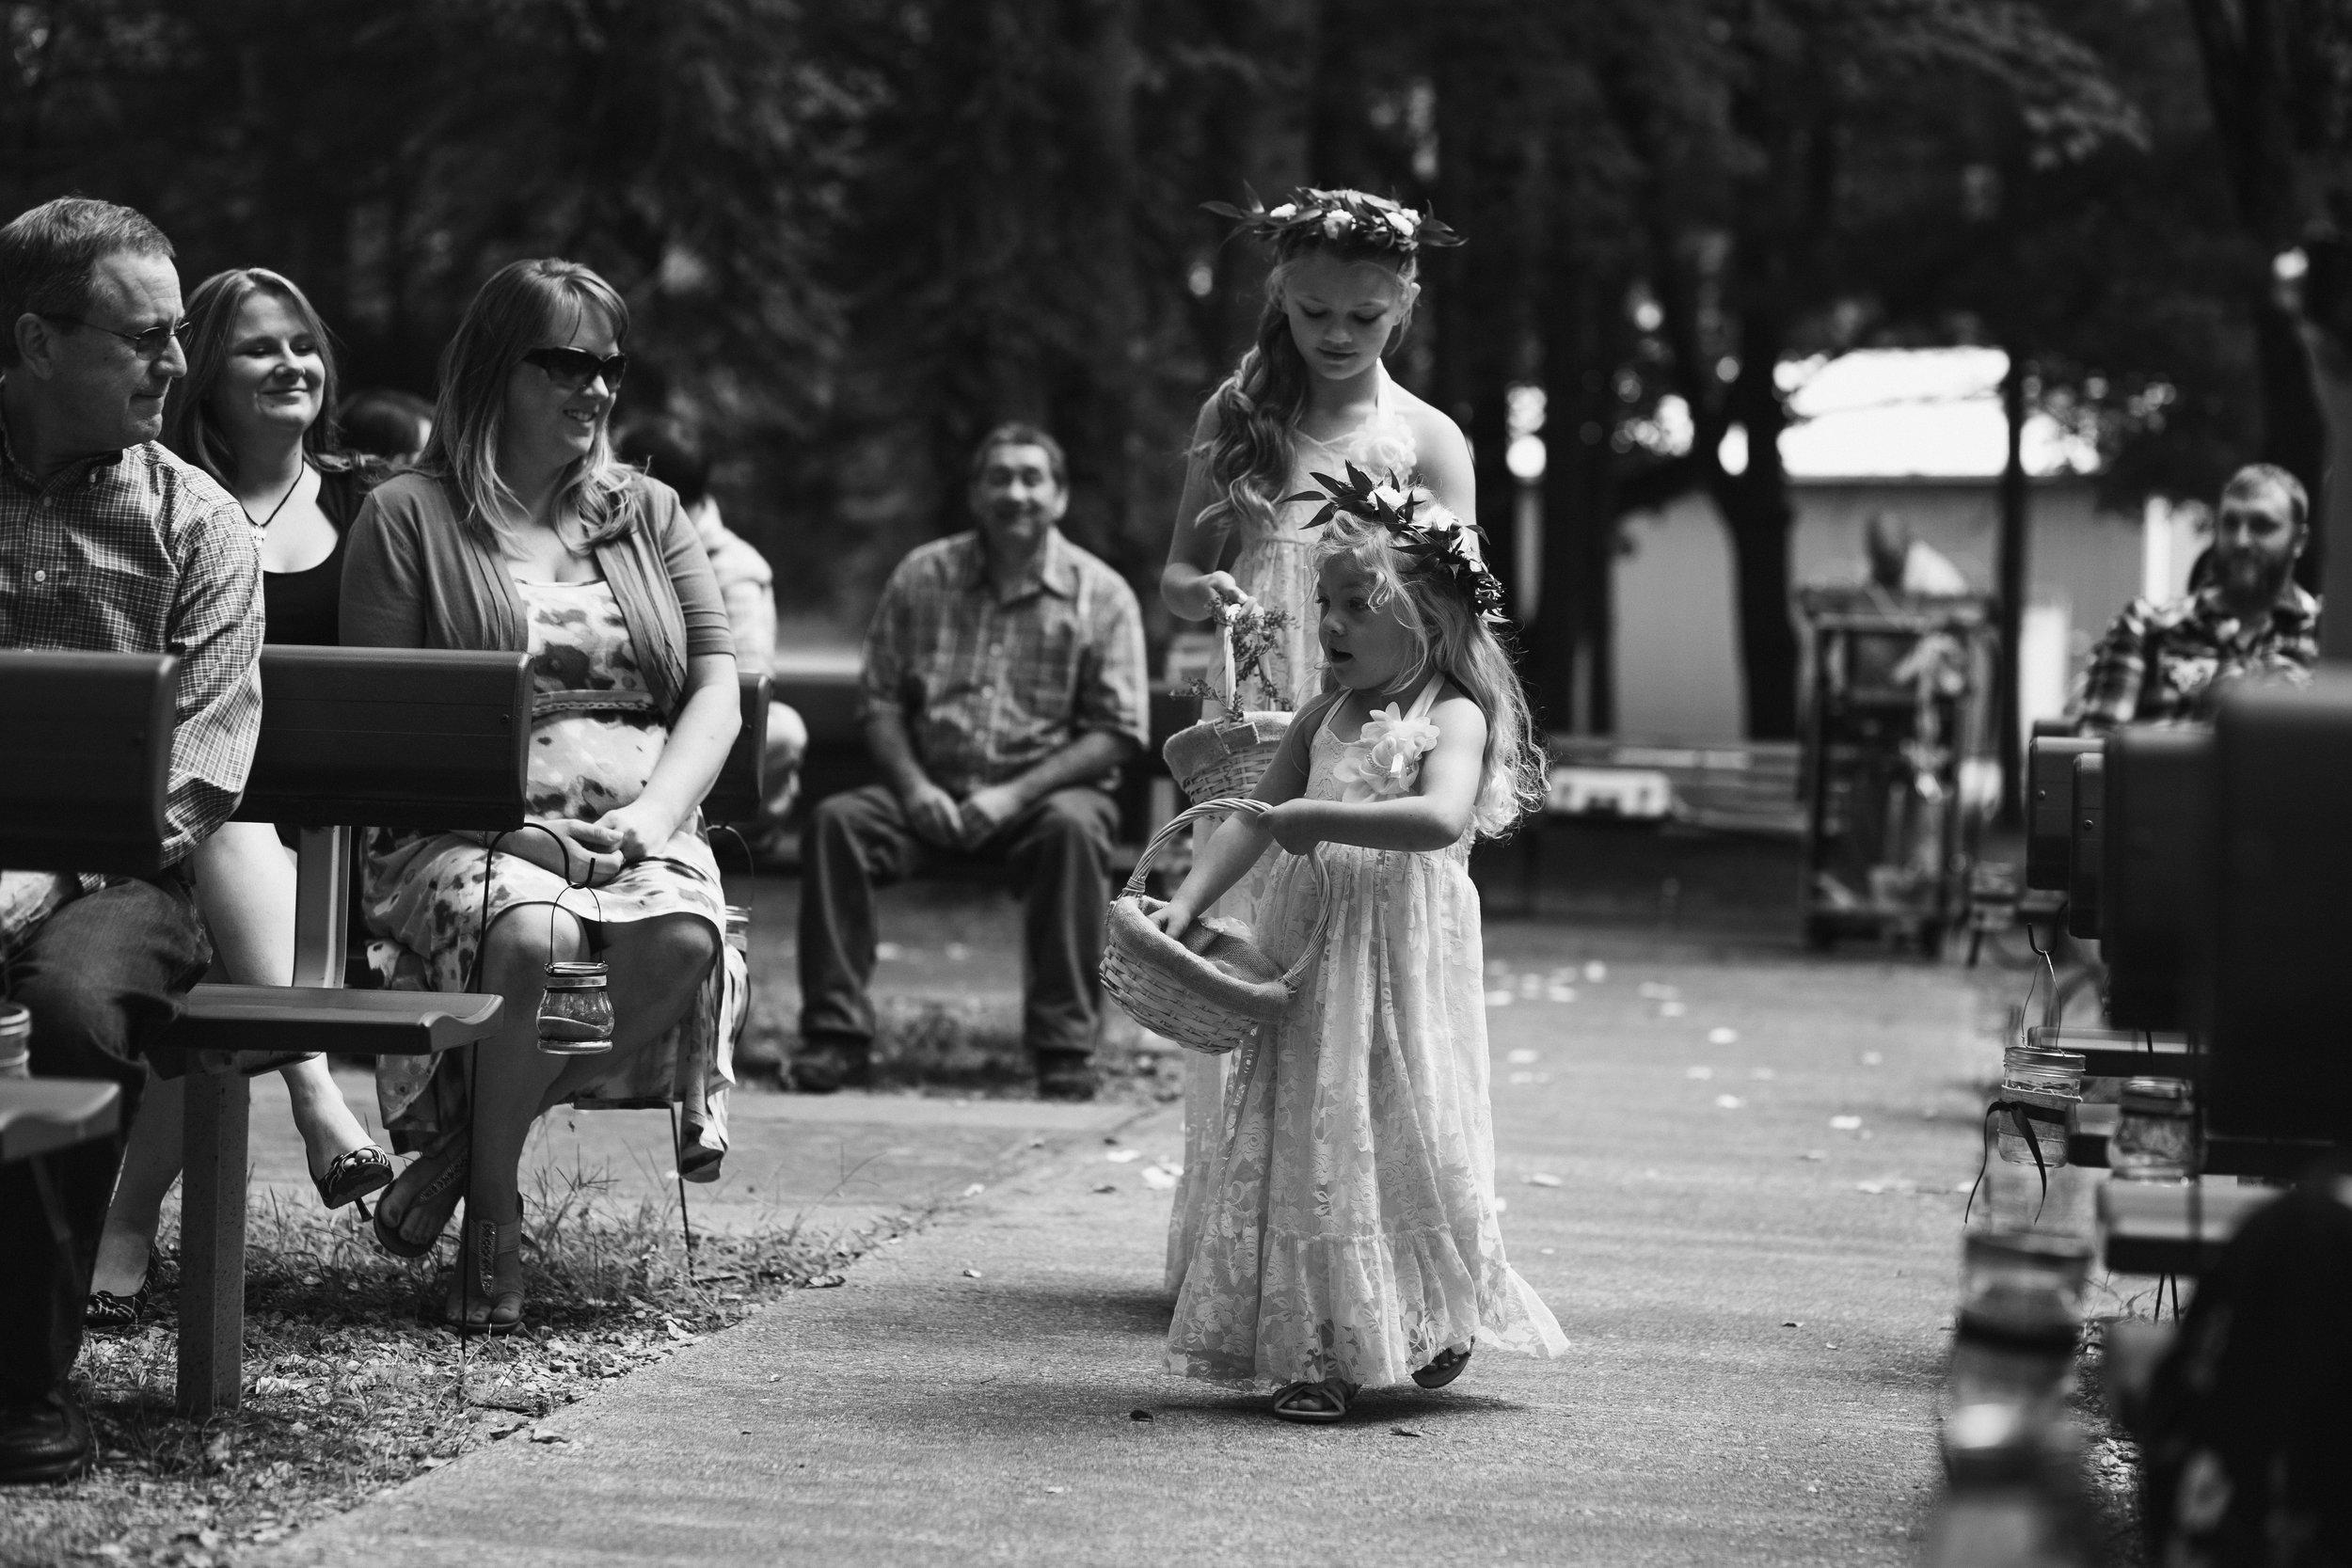 west-michigan-wedding-photographer-whitehall-rachel-austin-chapel-in-the-pines-232.jpg